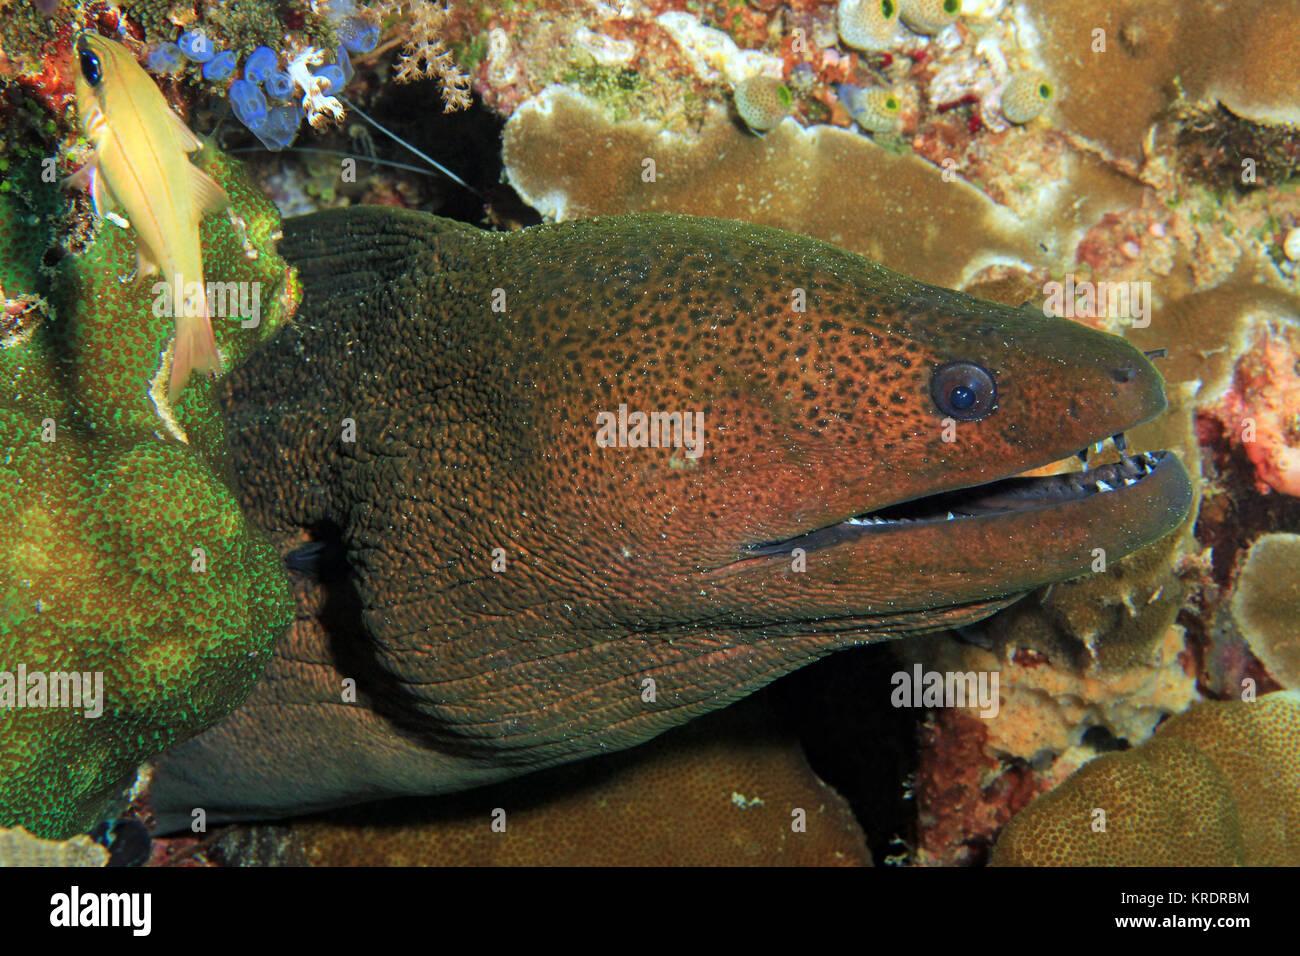 Giant Moray Eel (Gymnothorax javanicus). Raja Ampat, Indonesia - Stock Image